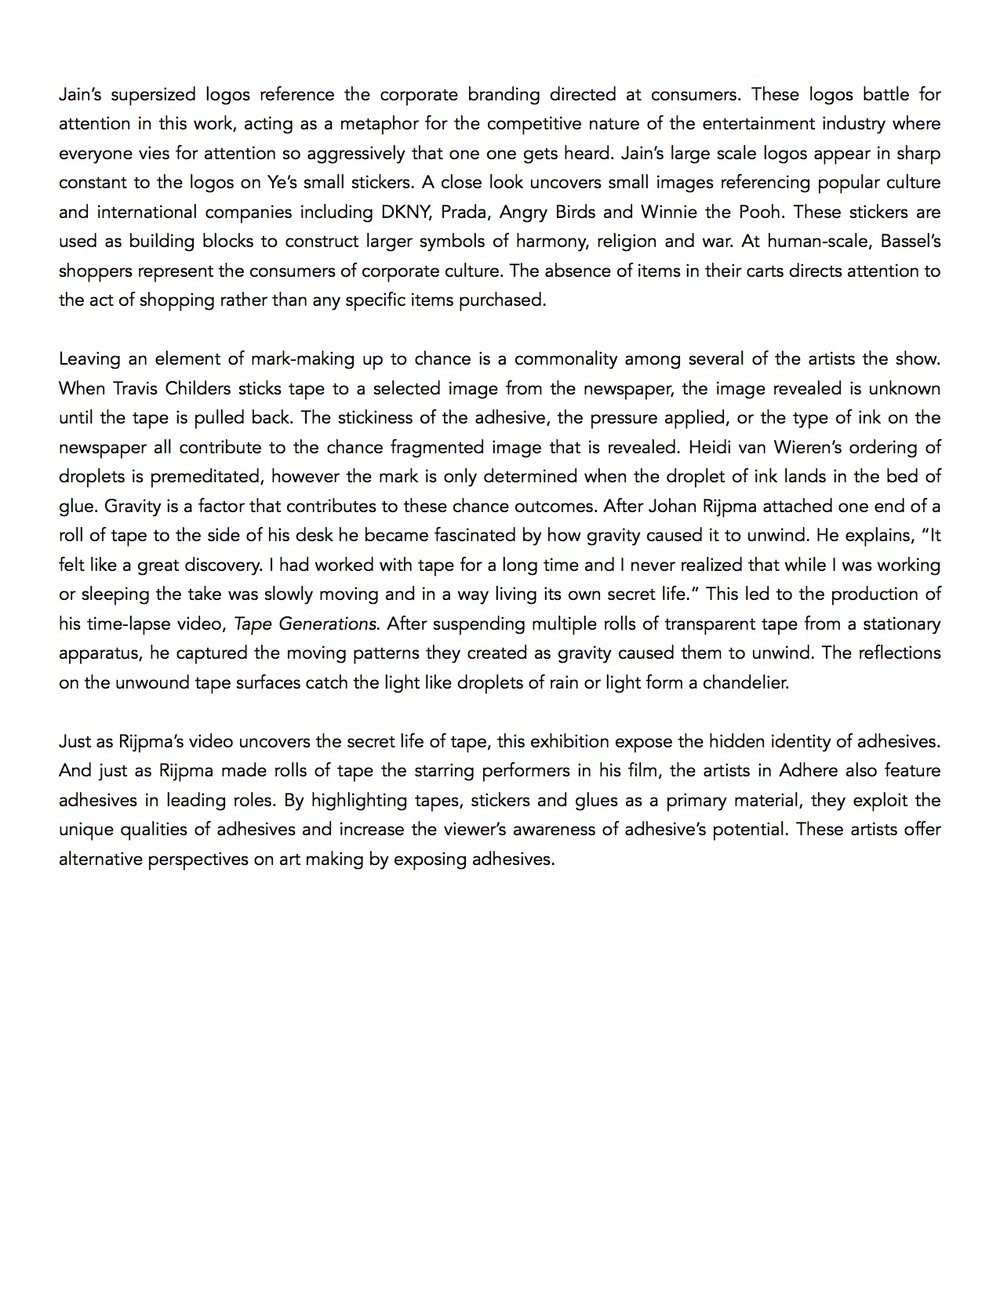 ExposingAdhesives_Essay_Pg3.jpg